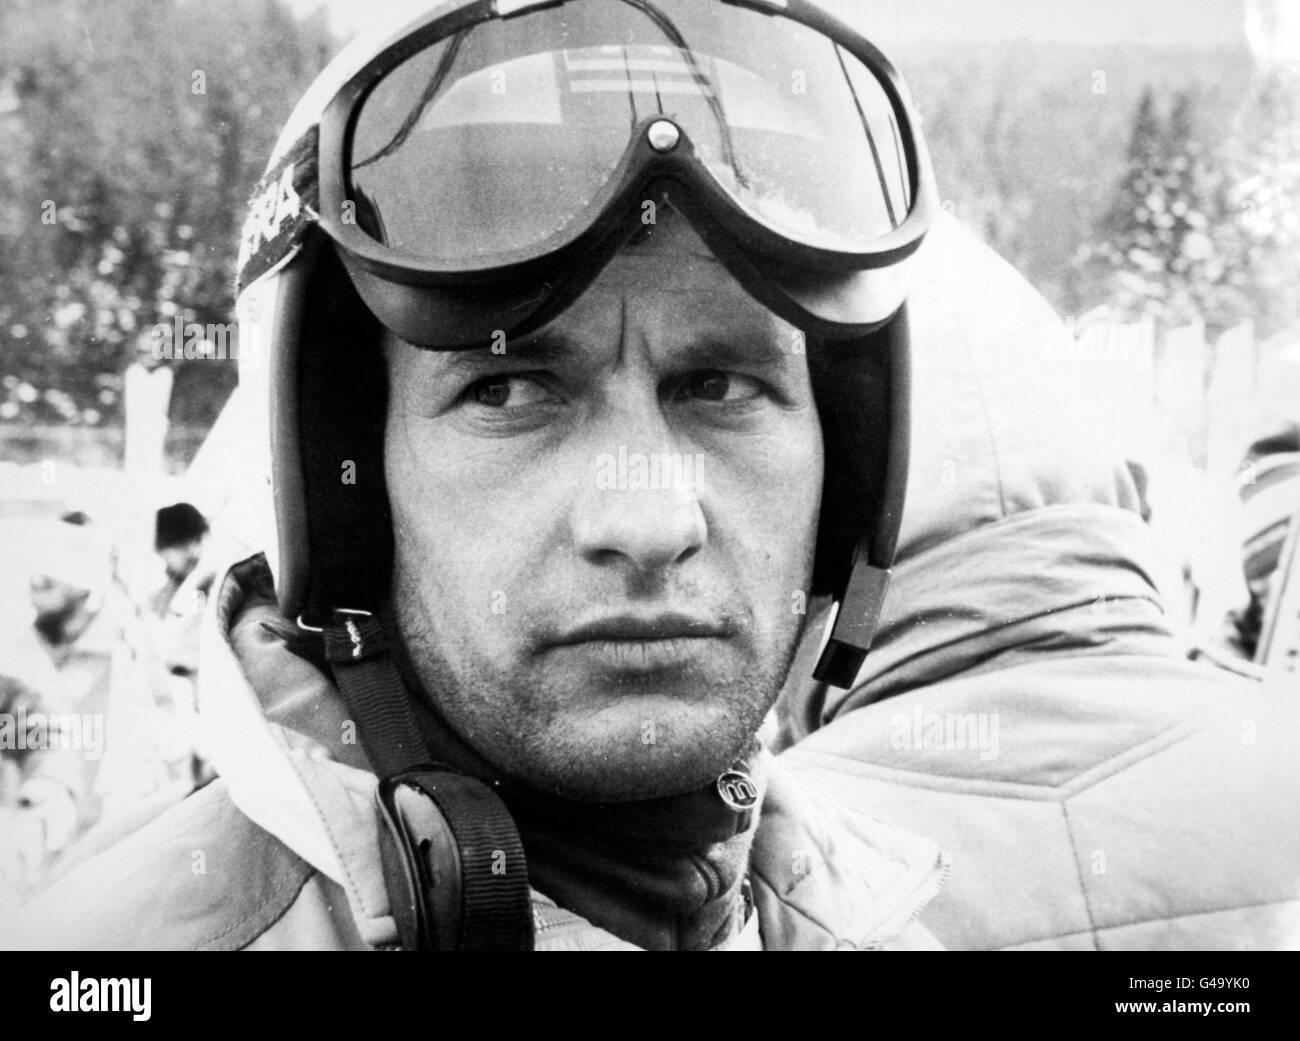 Skiing - Winter Olympic Games - Sarajevo 1984 - Men's Downhill - Stock Image